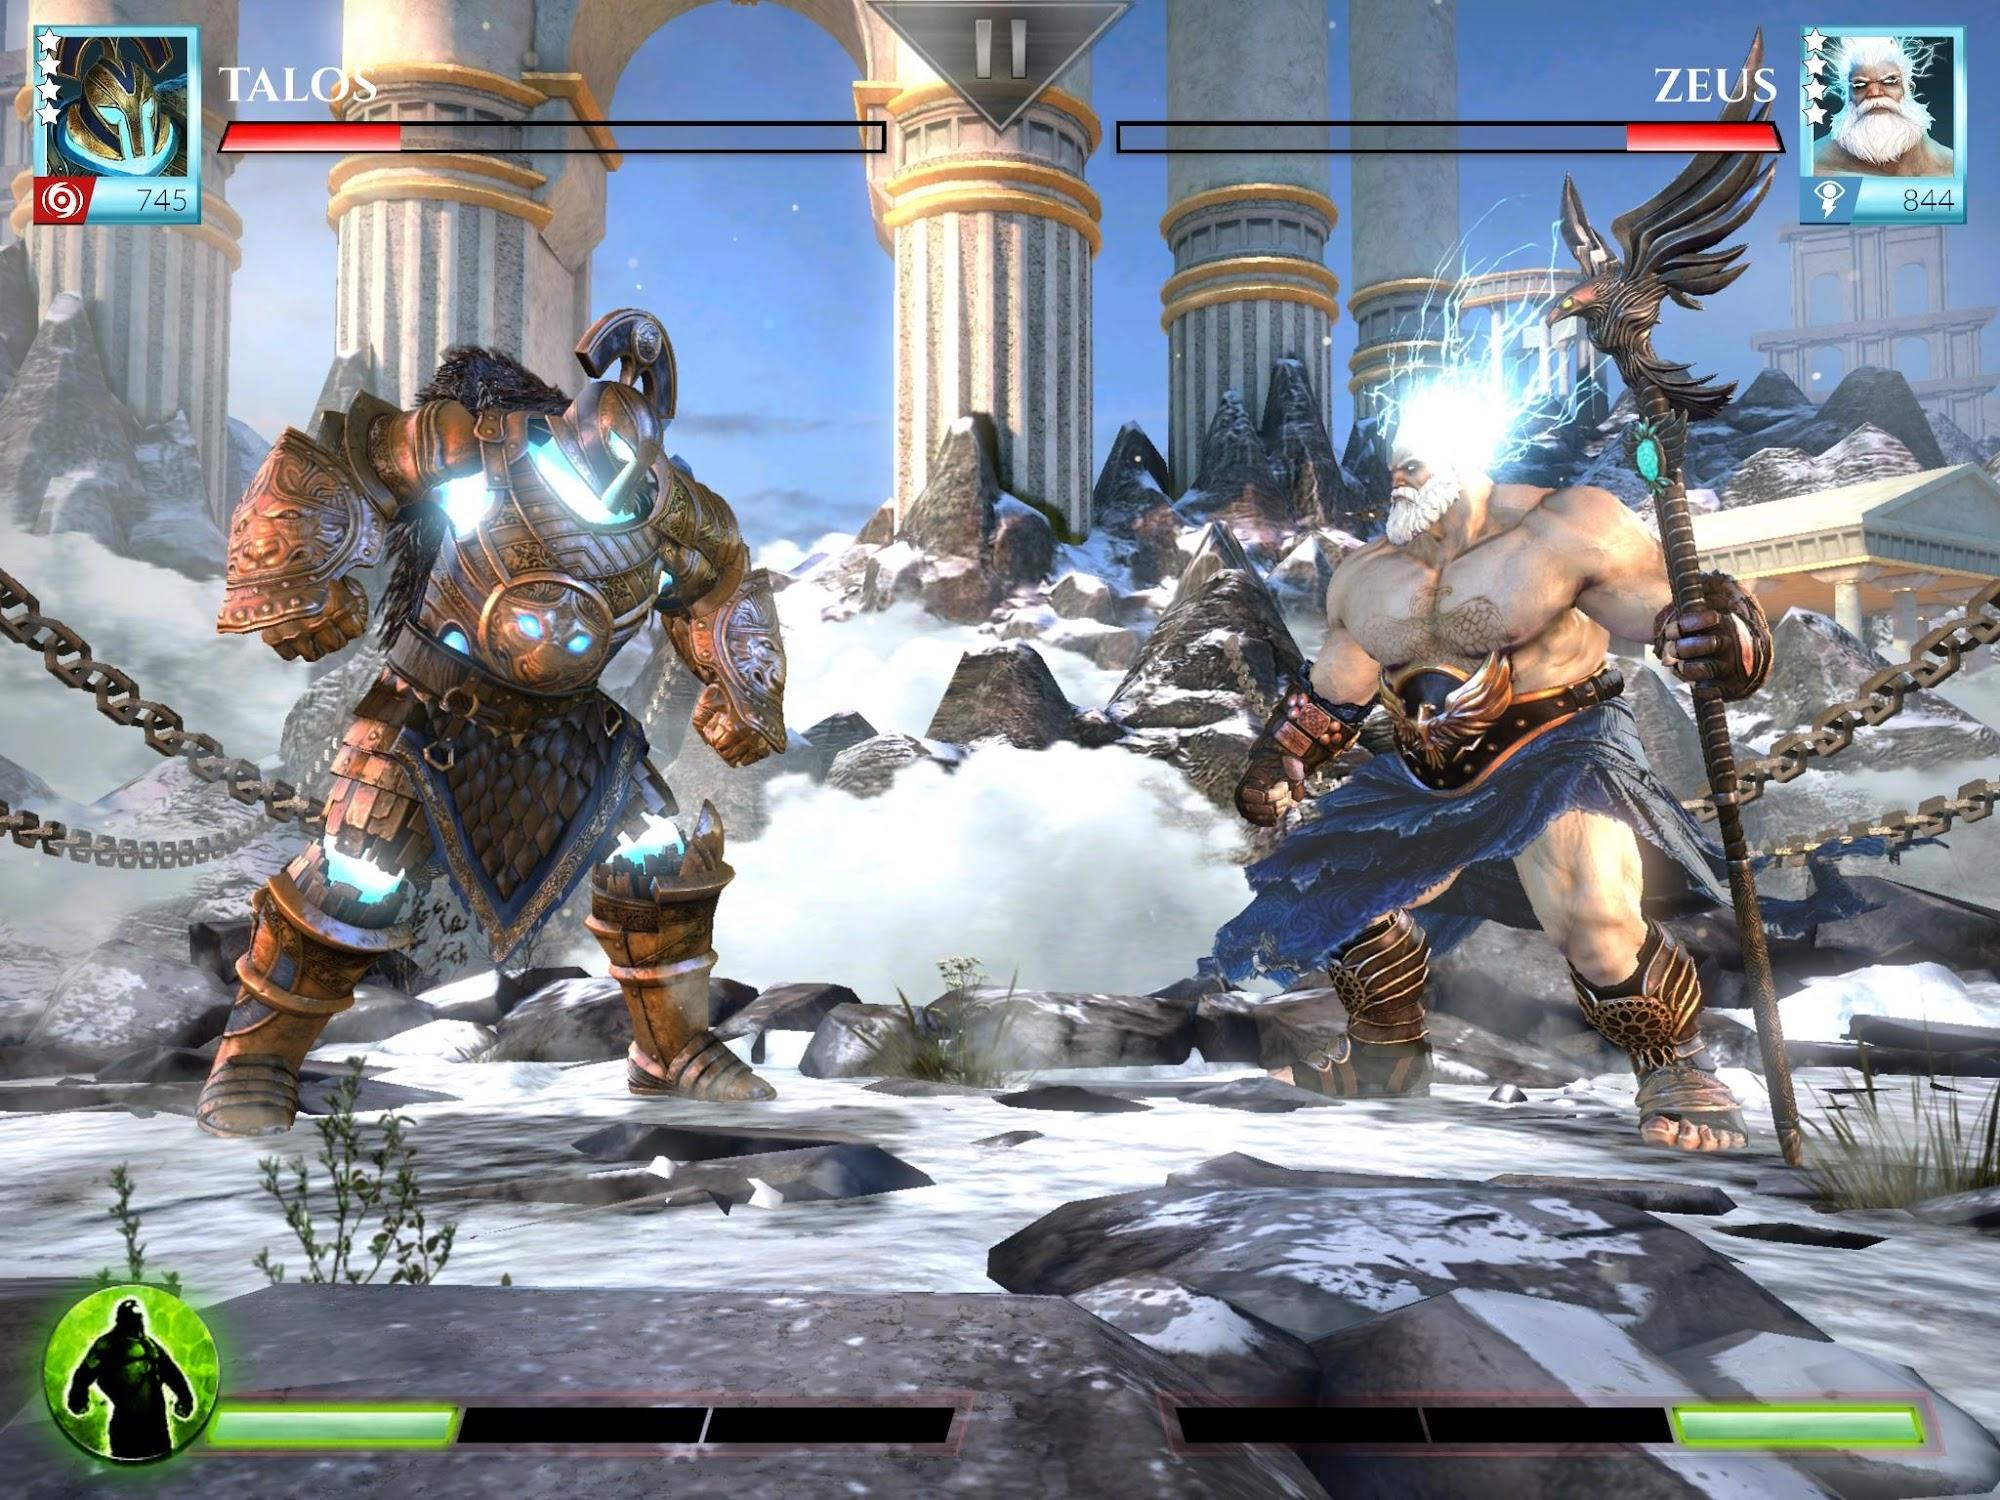 Gods of Rome screenshot #6